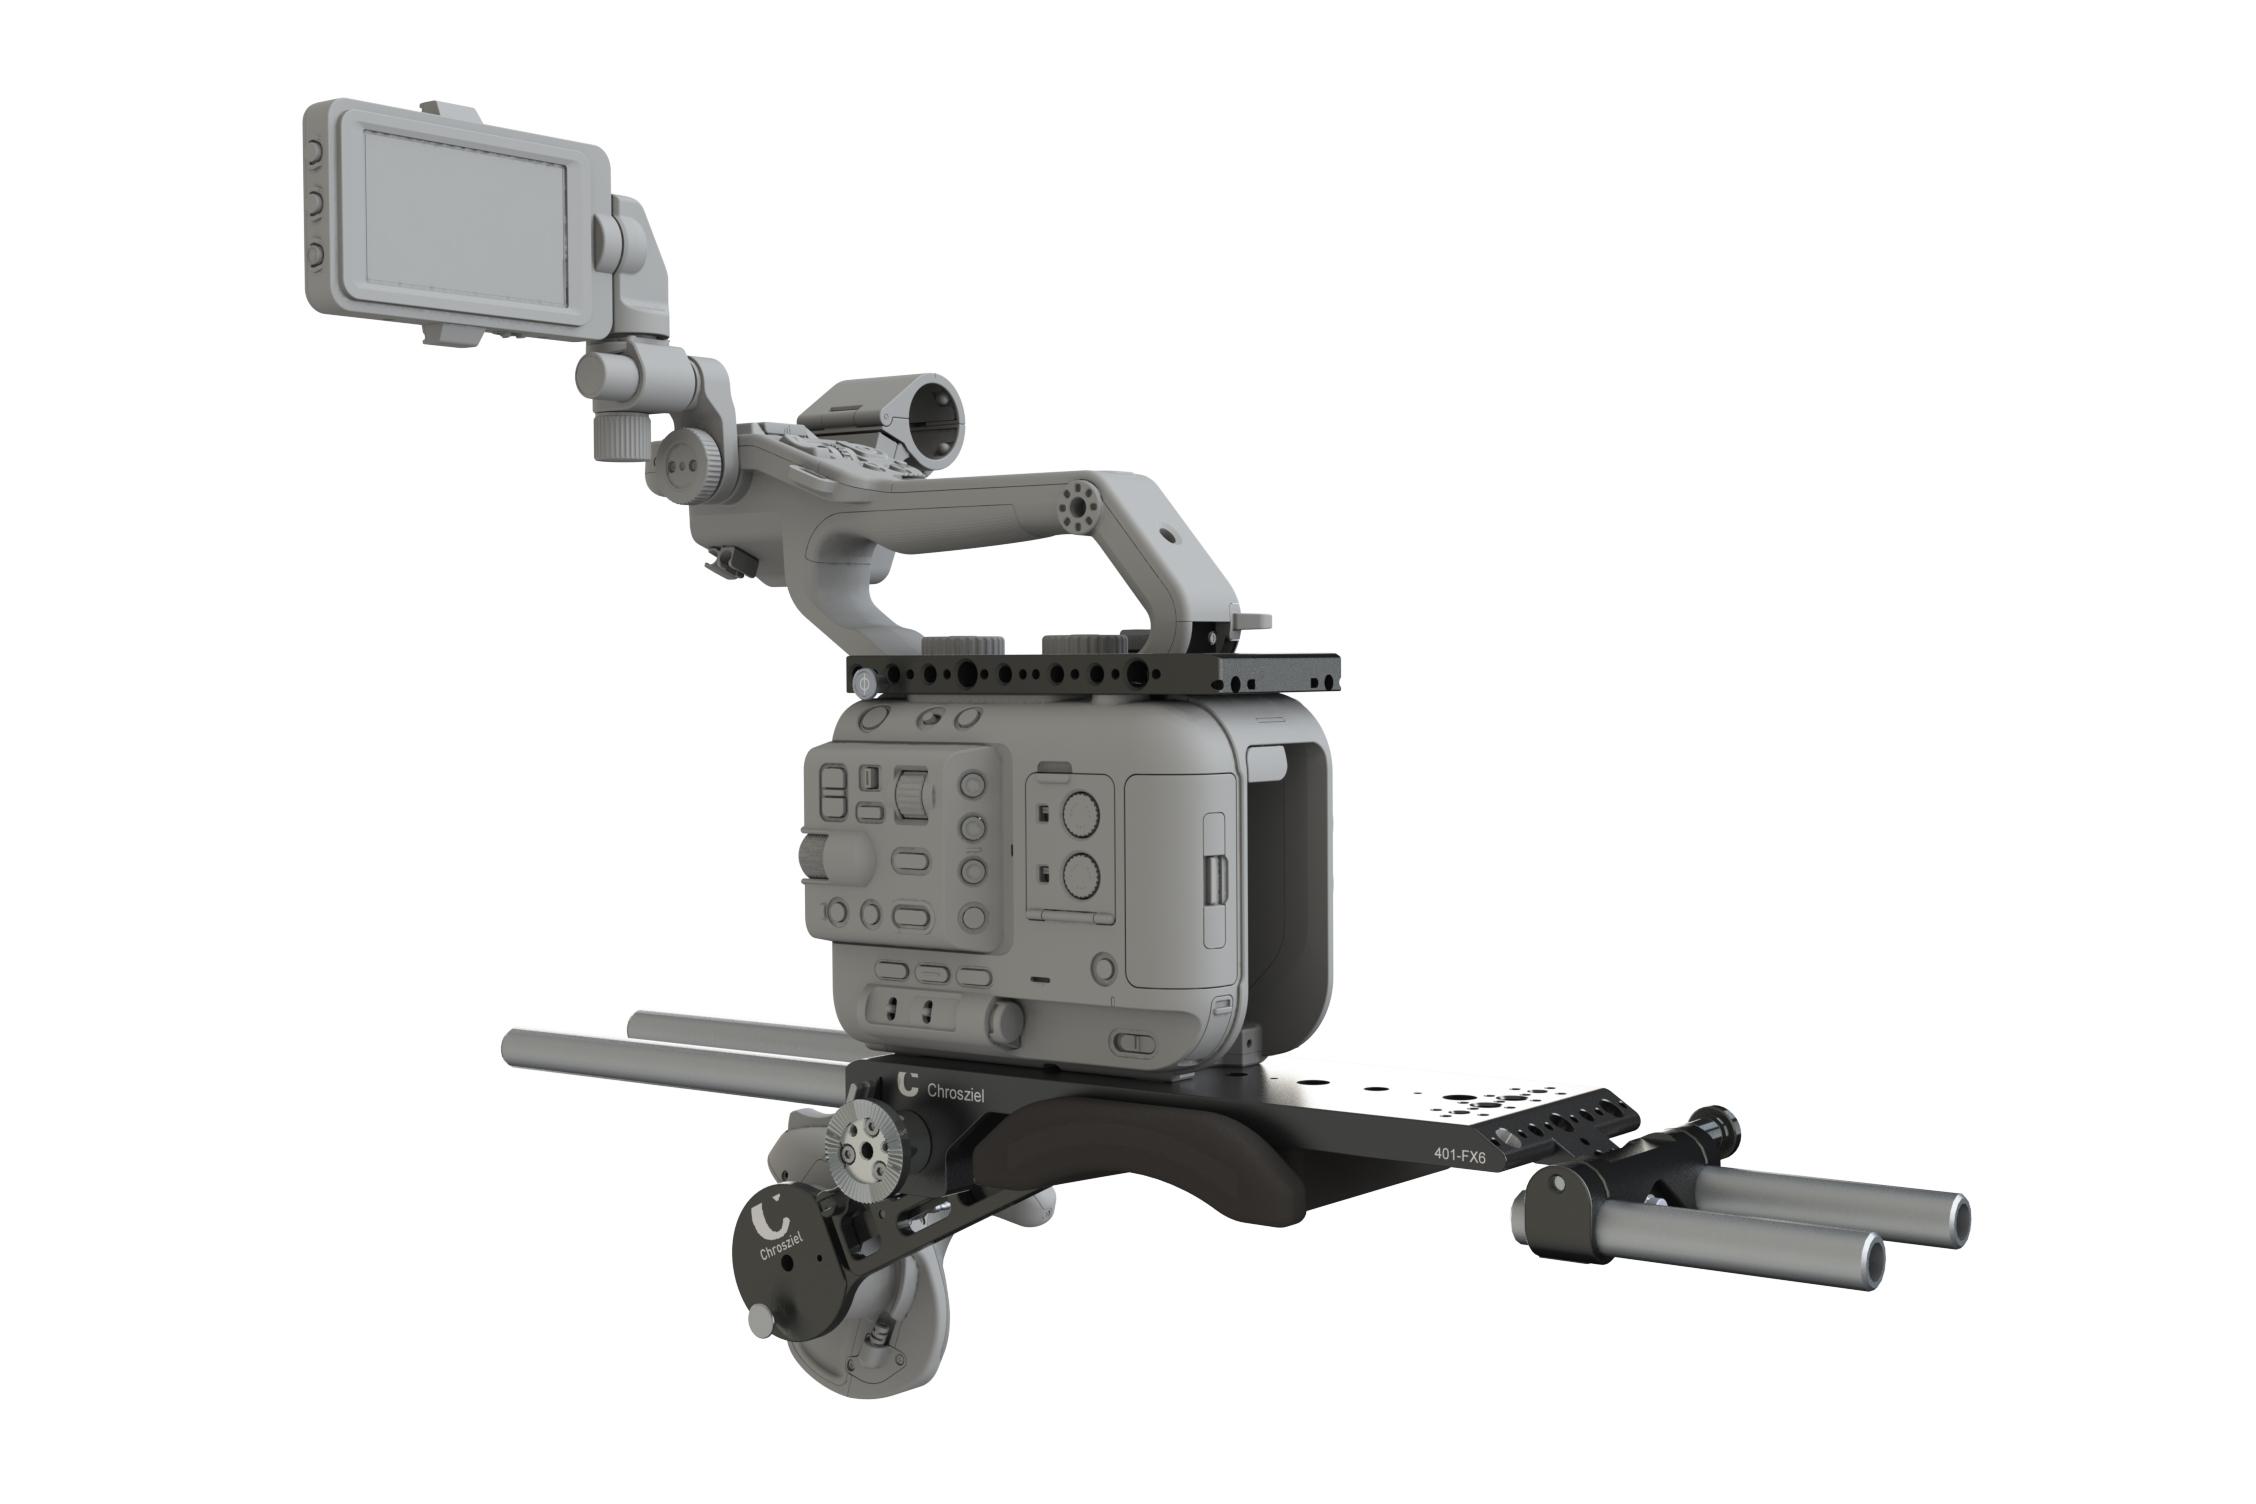 Kit LWS +Top Plate + Handgrip Extender for Sony PXW-FX6